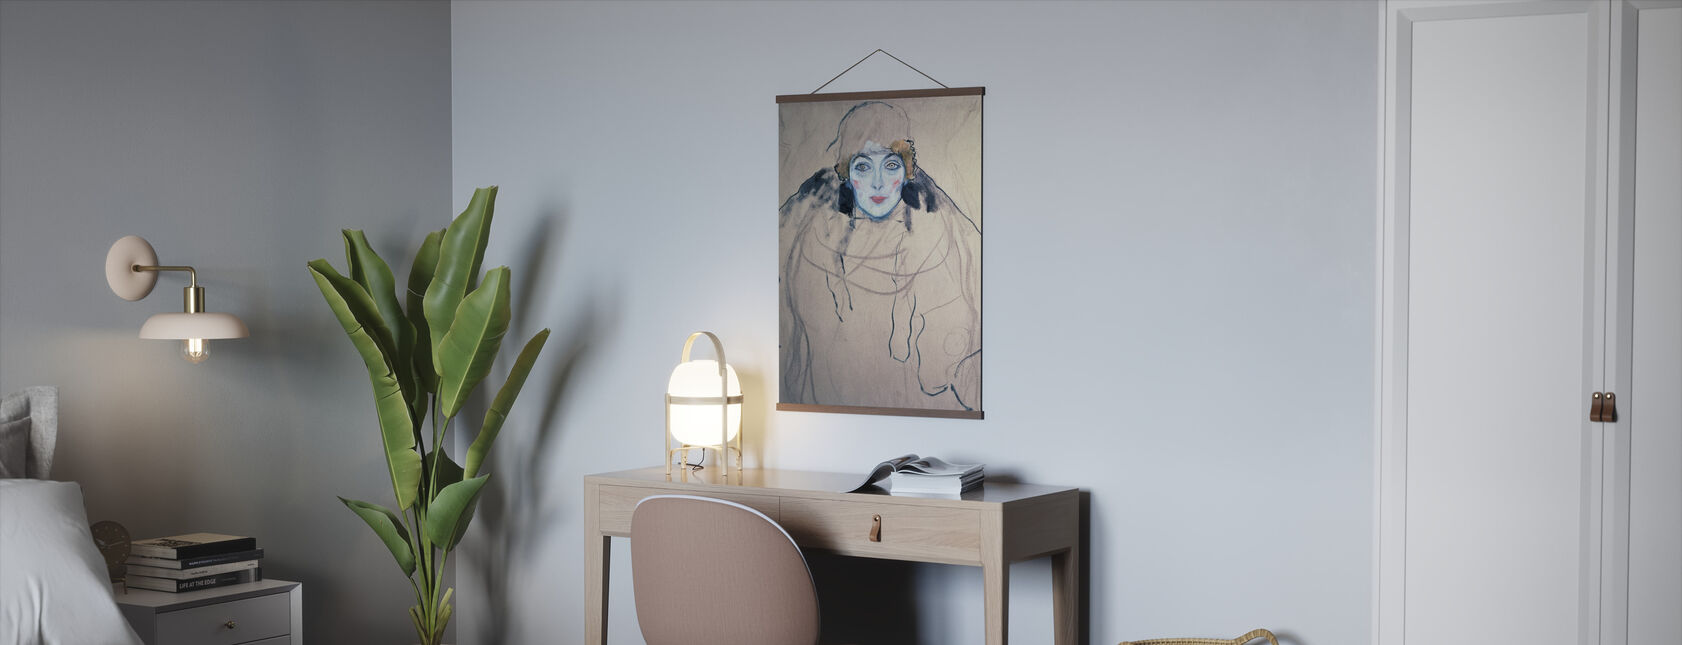 Kopf einer Frau, Gustav Klimt - Poster - Büro